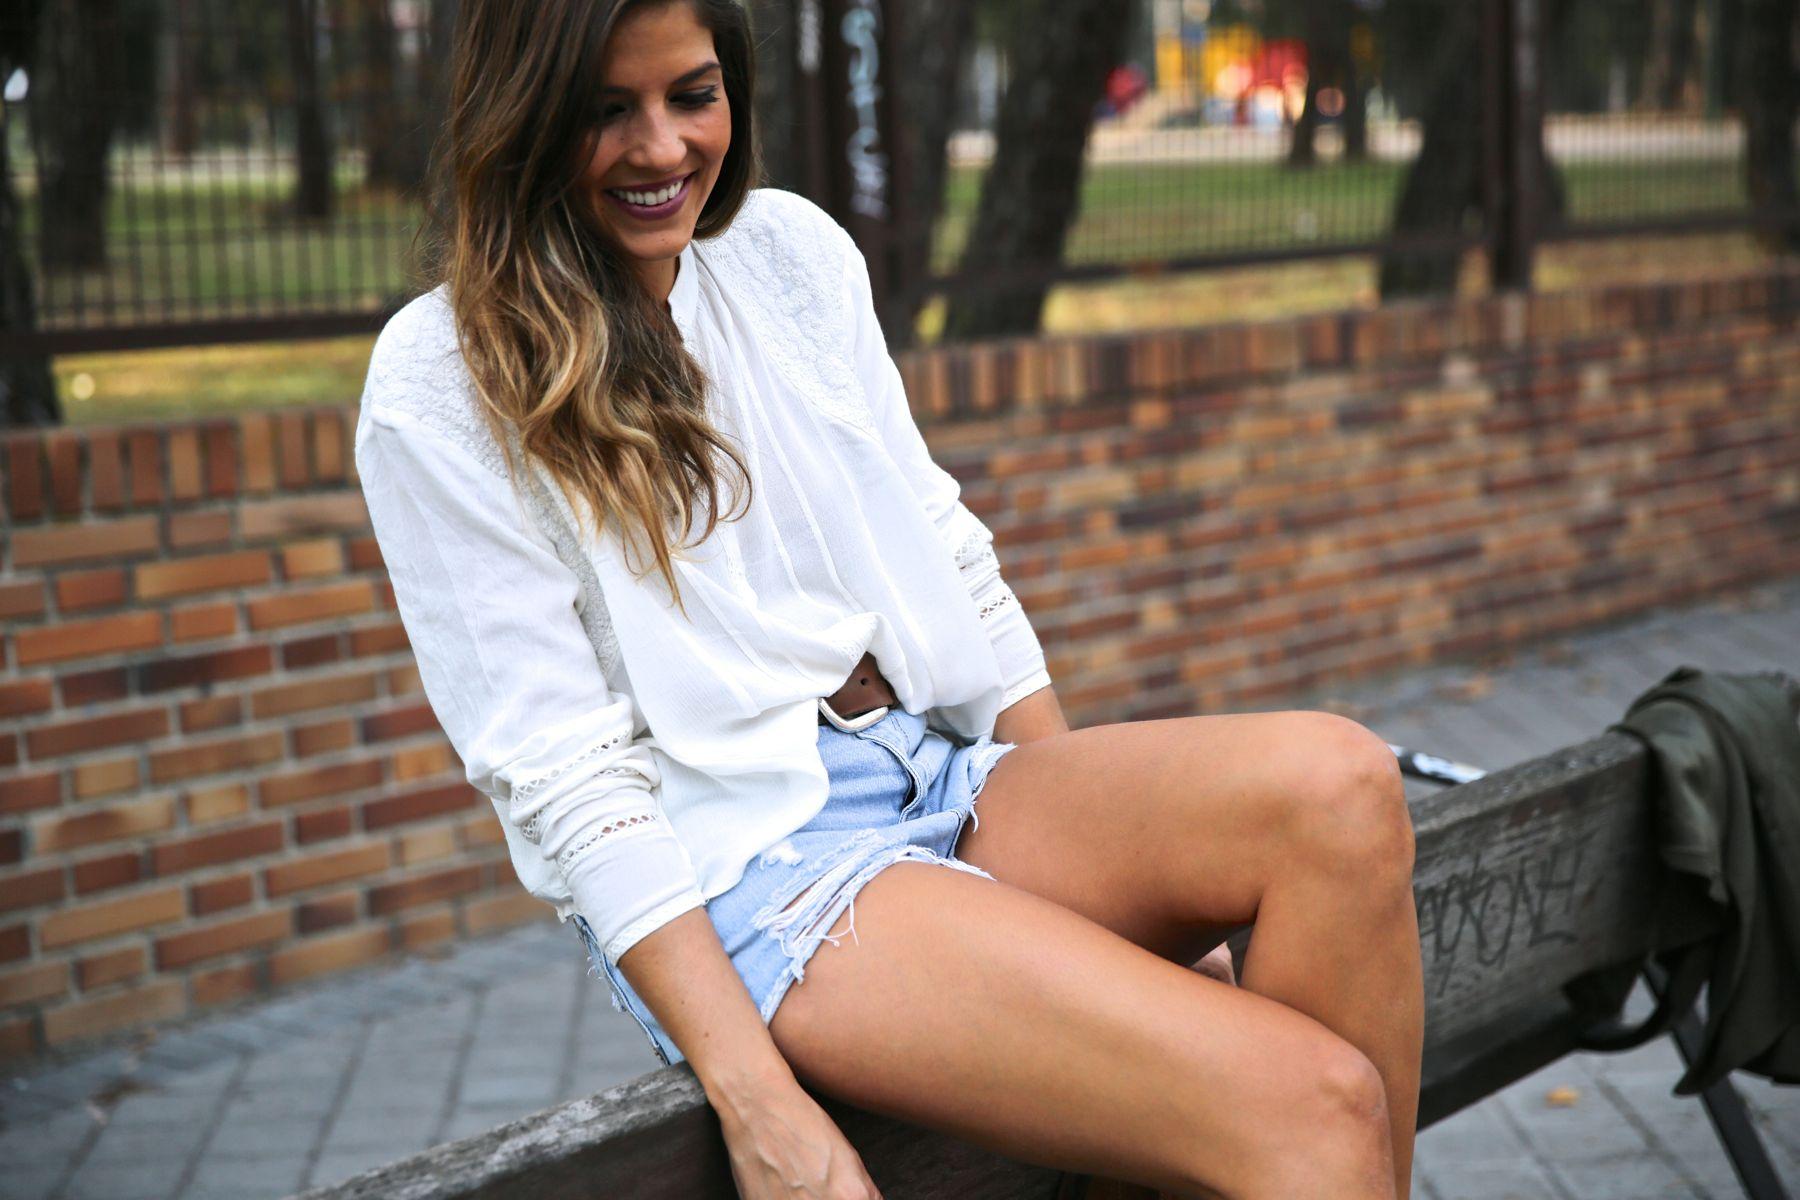 trendy_taste-look-outfit-street_style-ootd-blog-blogger-fashion_spain-moda_españa-boho-hippie-flecos-botines_camperos-cowboy_booties-mochila-backpack-blusa-camisa-denim-shorts-vaqueros-3